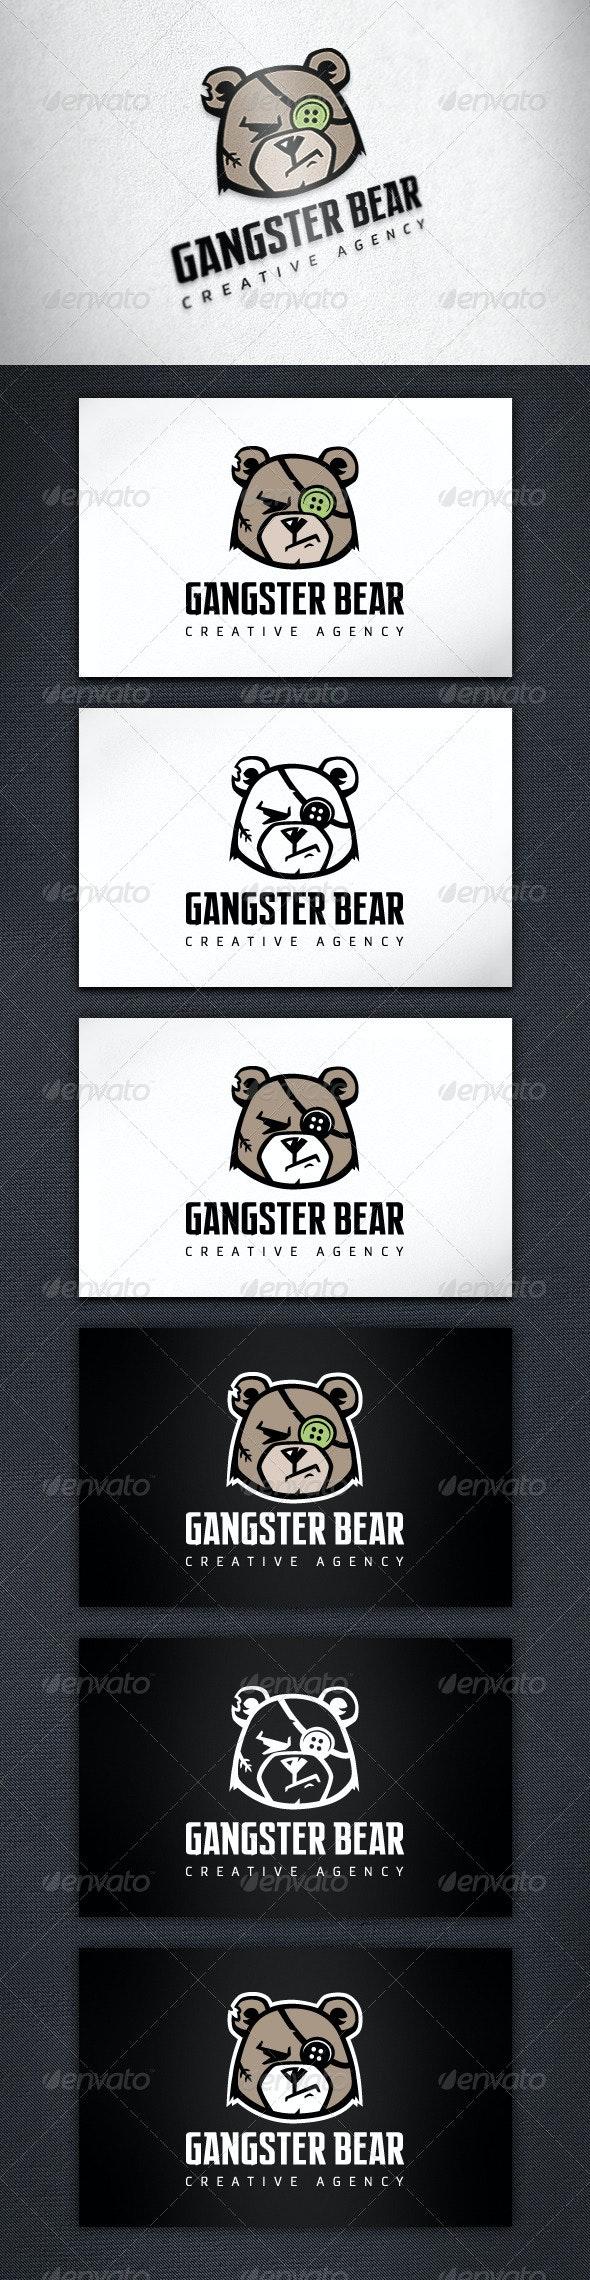 Gangster Bear Logo Template - Animals Logo Templates